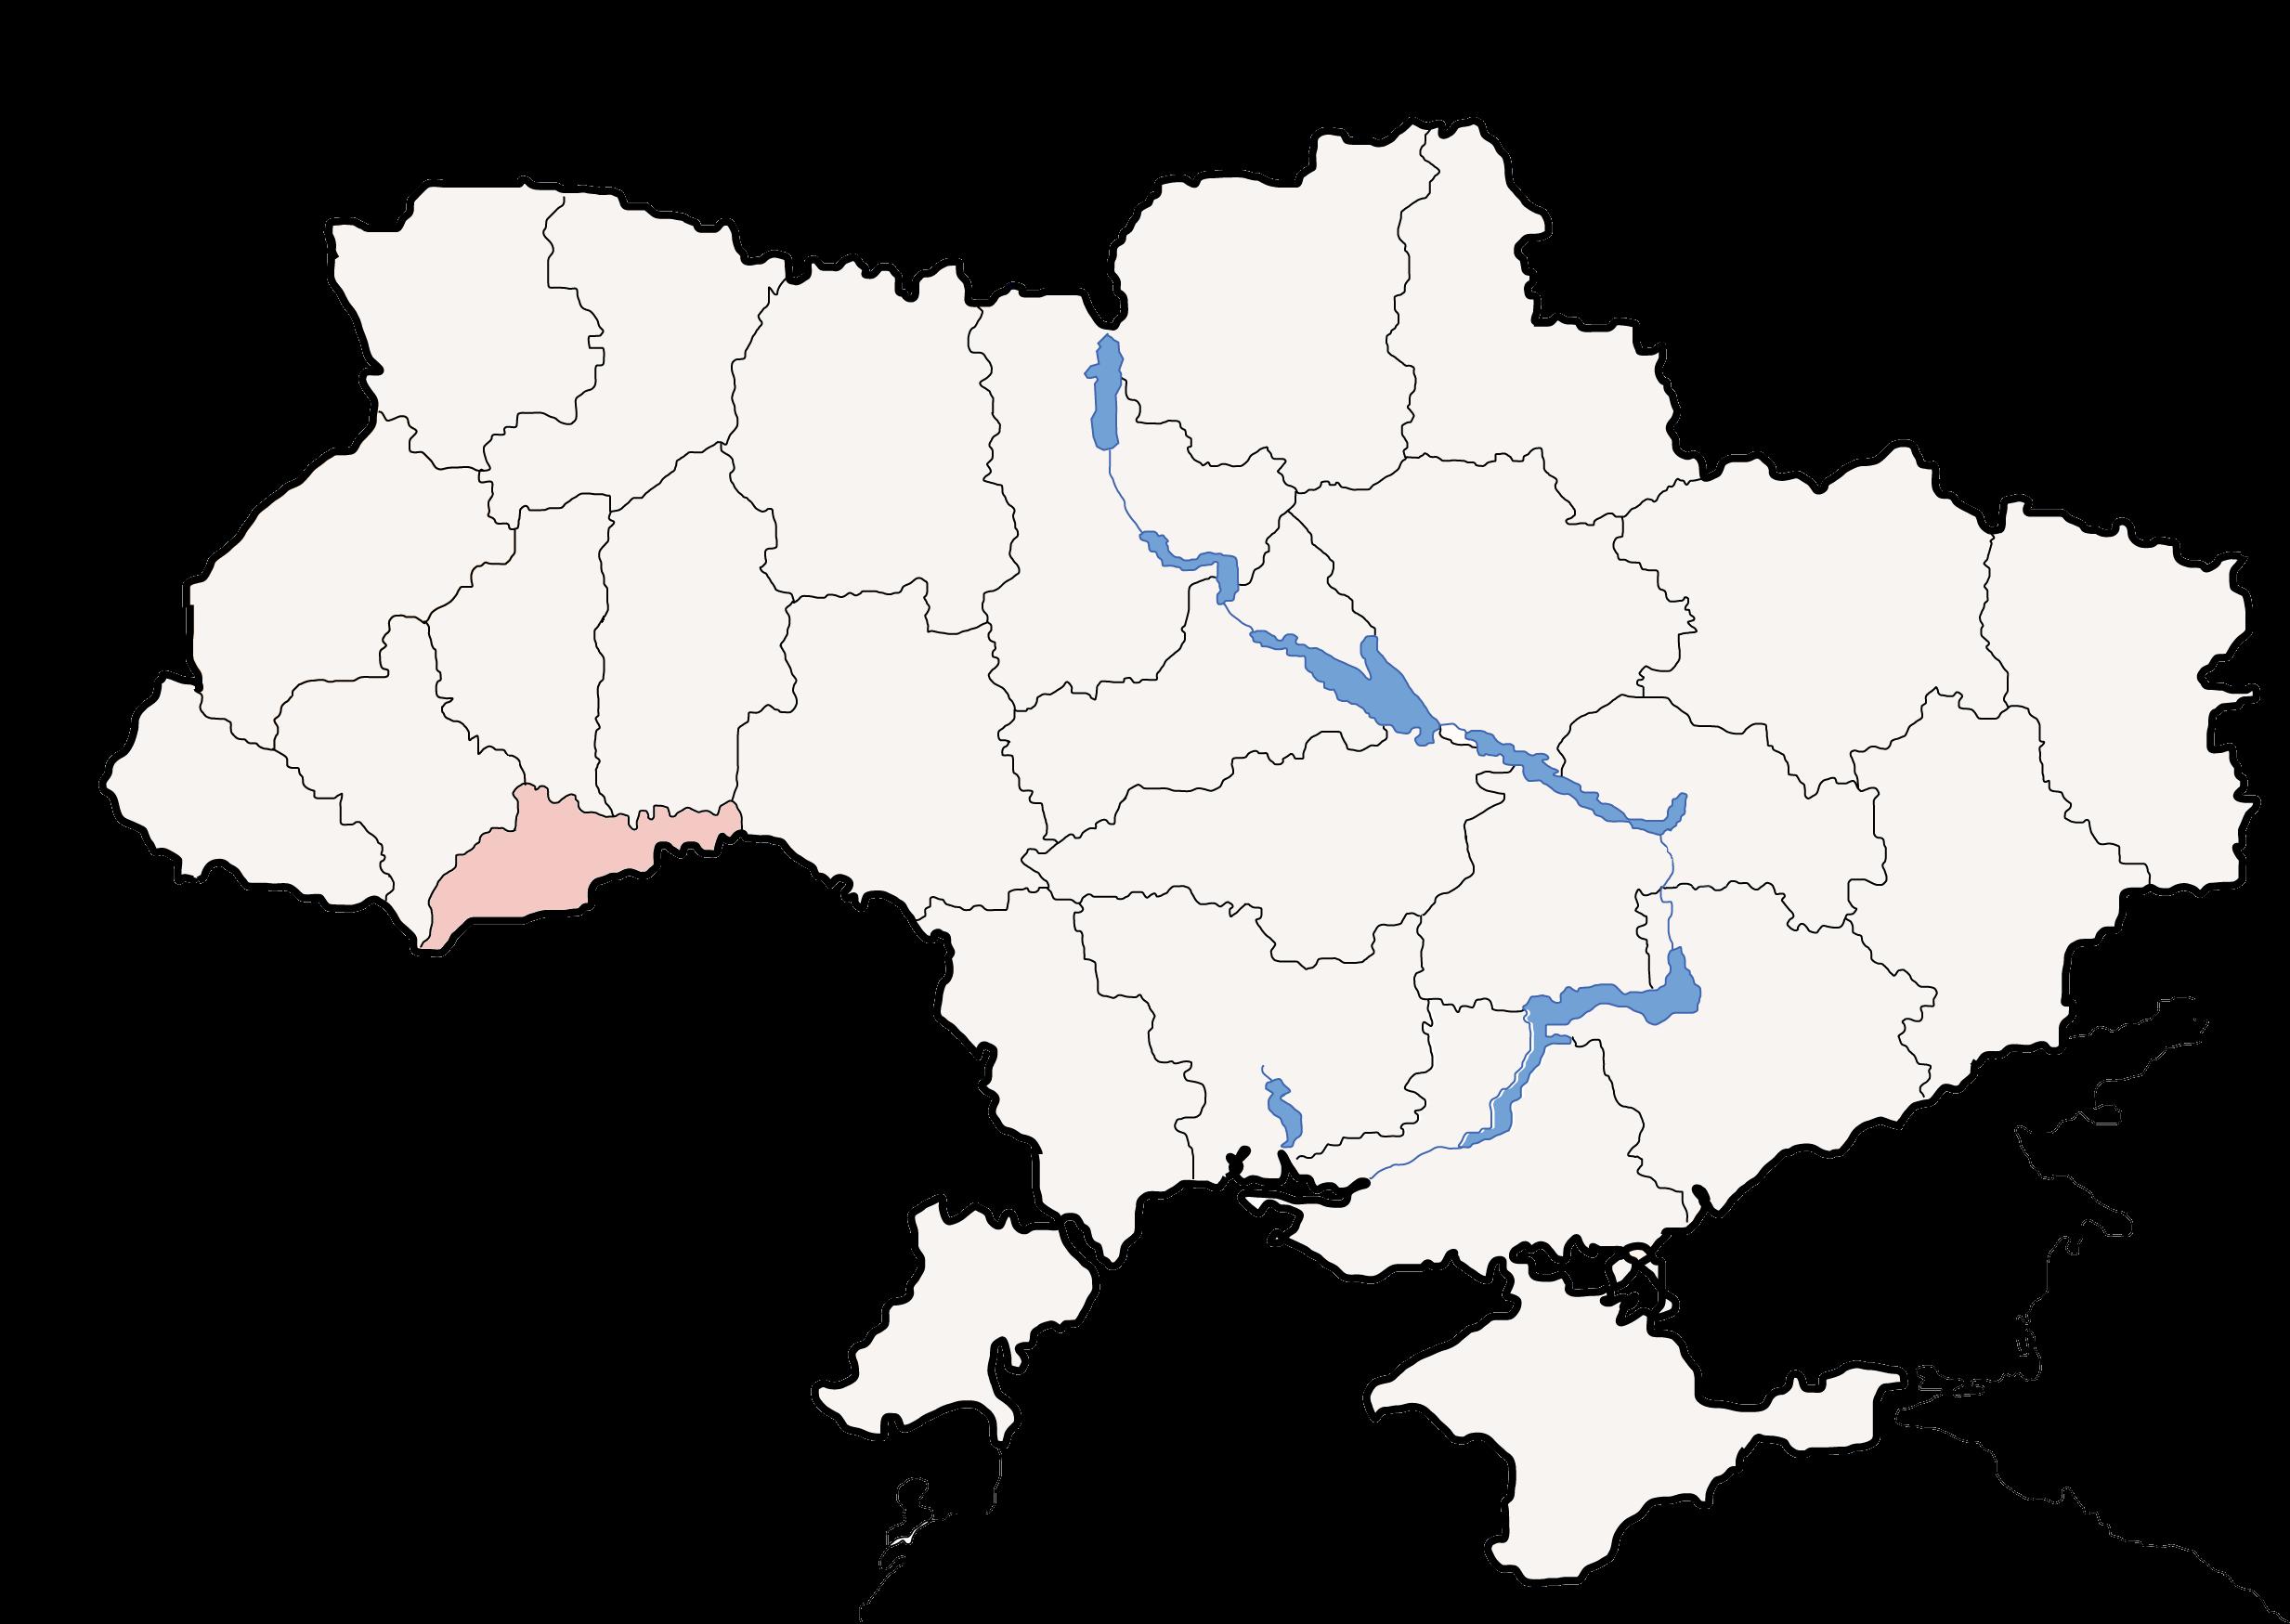 File:Map of Ukraine political simple Oblast Czernowitz.png - Wikipedia